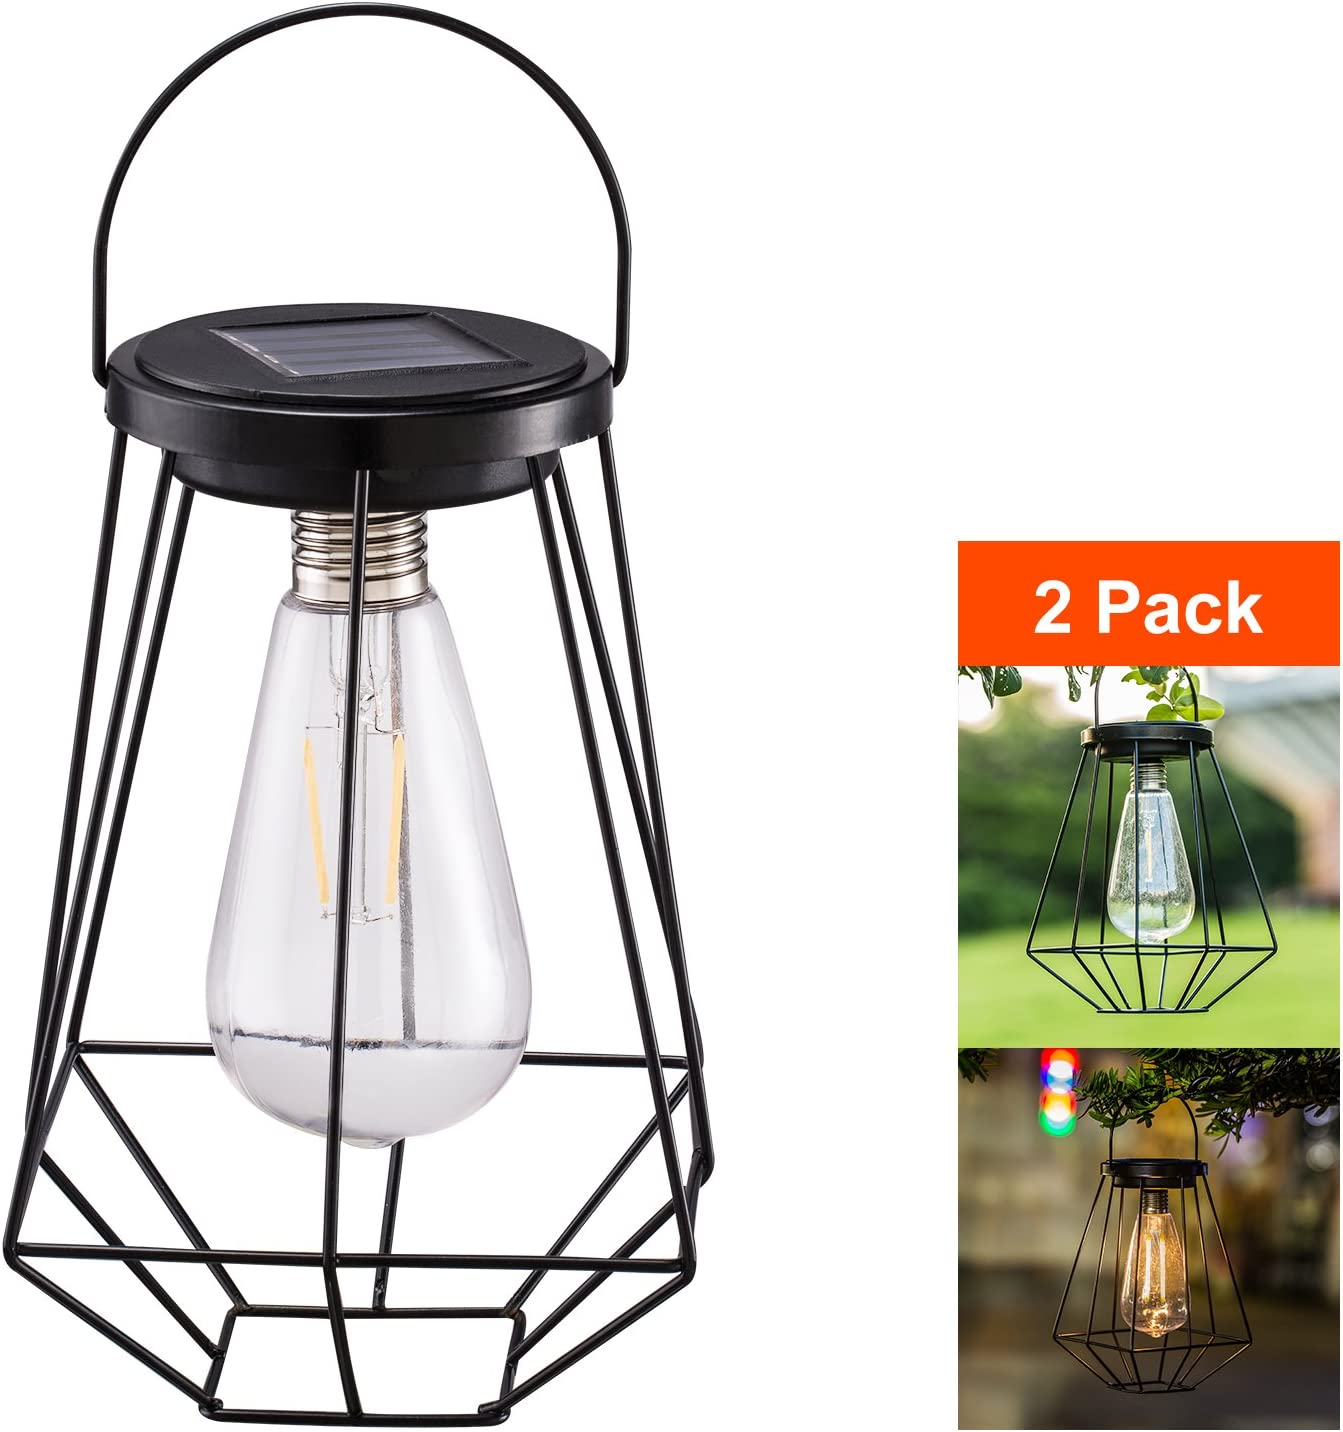 Outdoor Solar Lantern Lamp